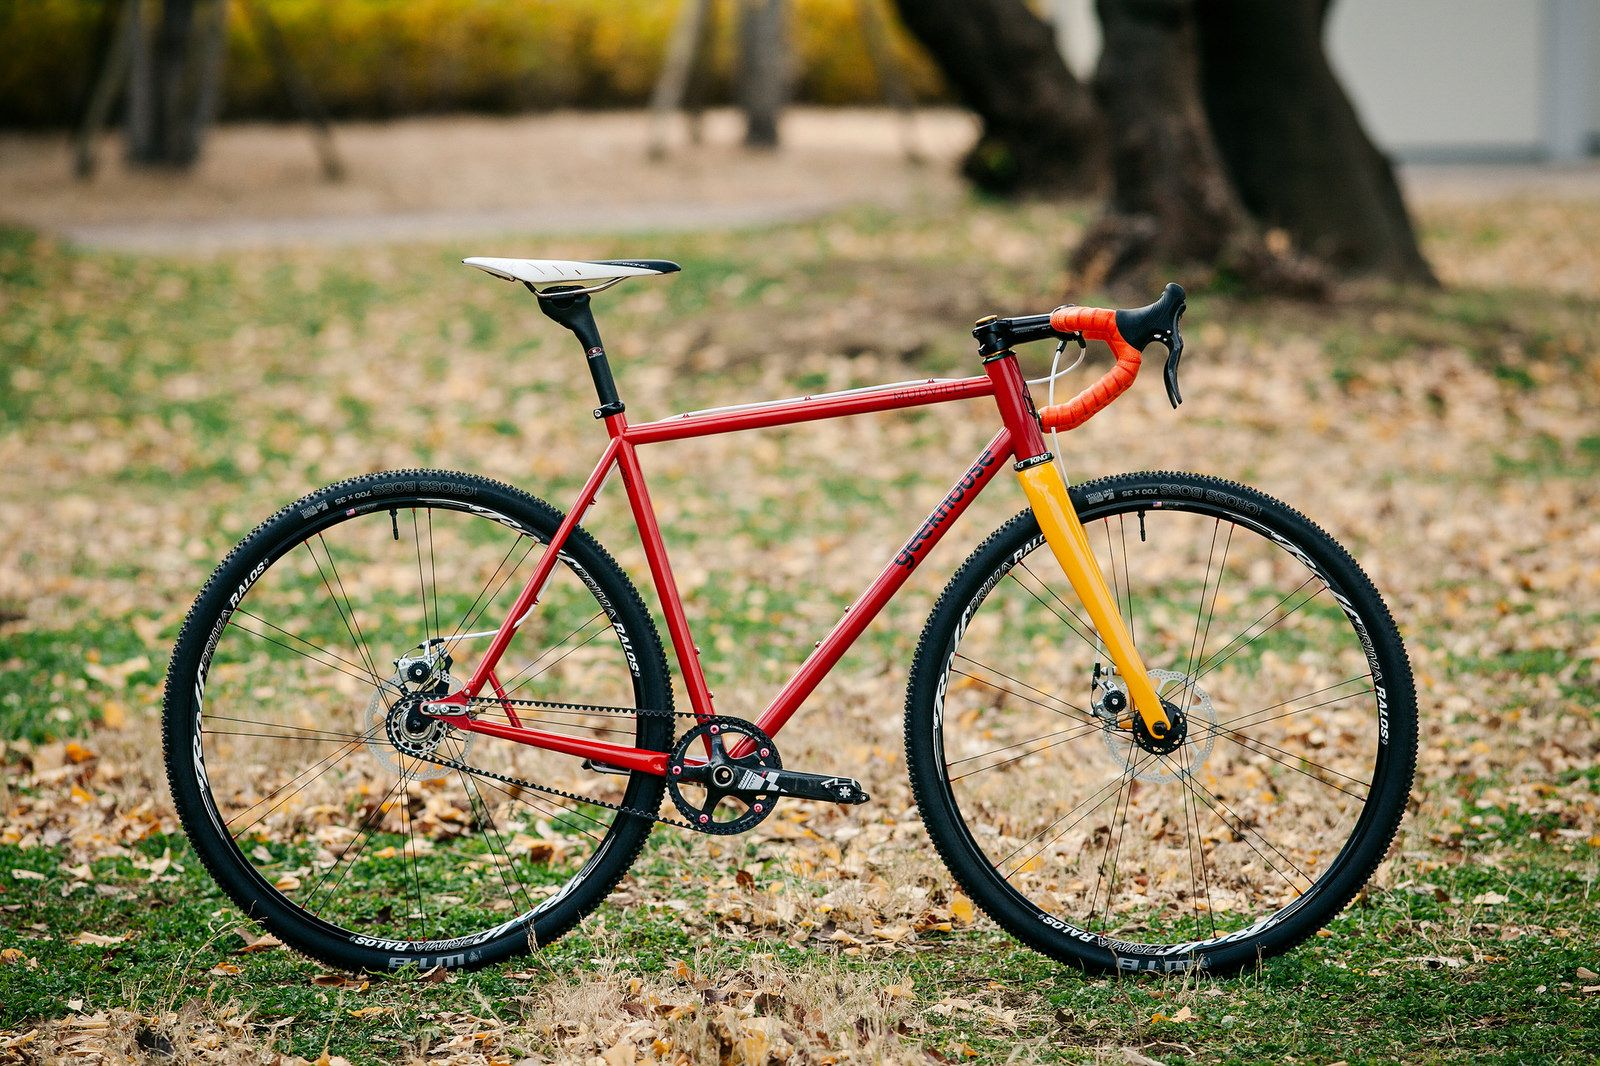 Geekhouse Bikes Mudville Sscx Belt Drive Complete Bike Belt